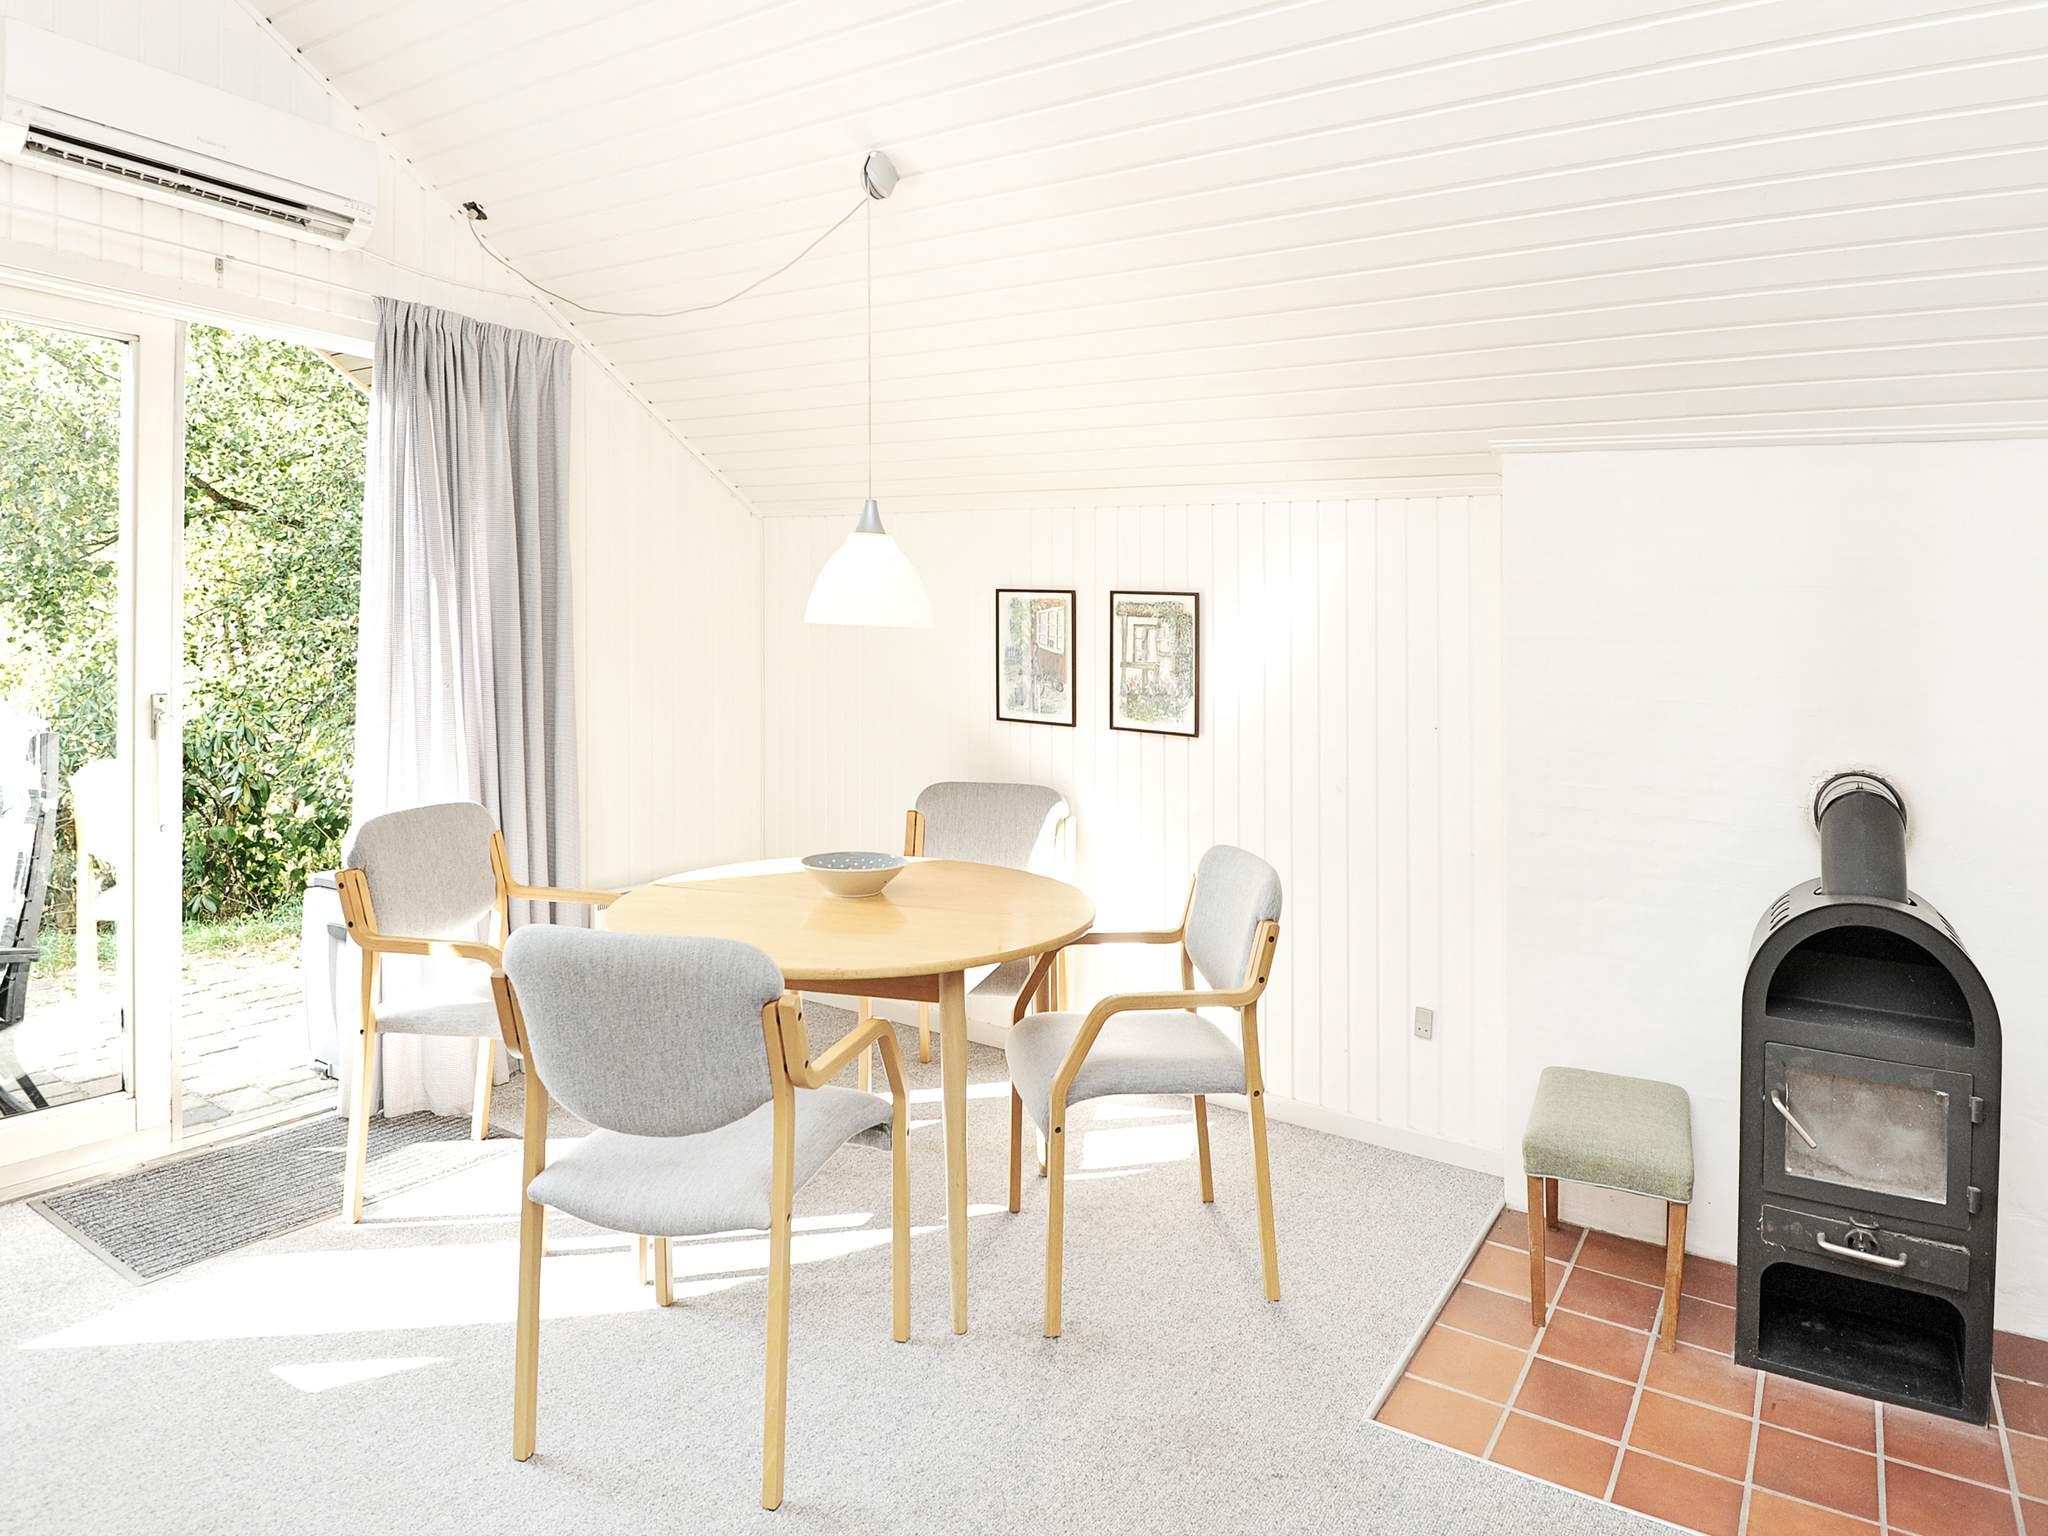 Ferienhaus Ry (83836), Ry, , Ostjütland, Dänemark, Bild 16